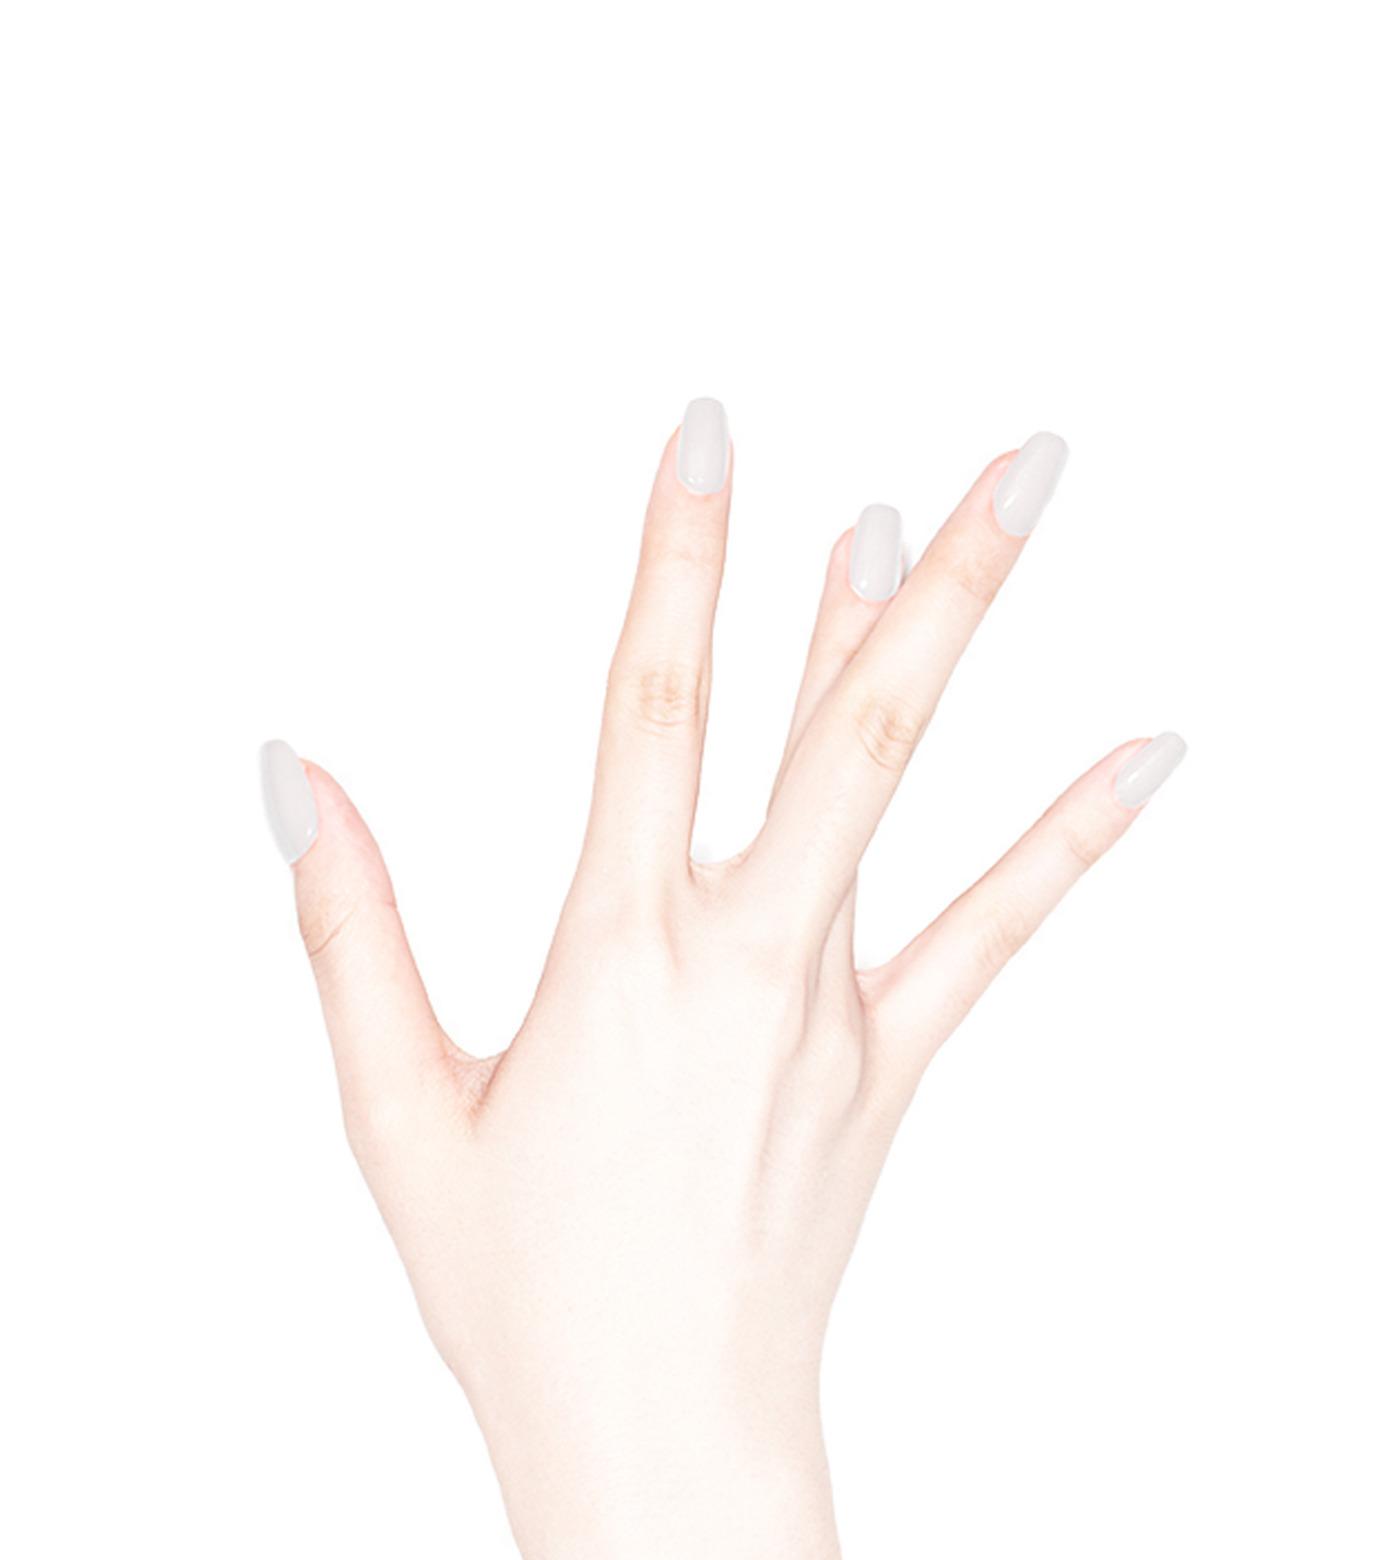 GRANJE(グランジェ)のMariage-WHITE(MAKE-UP/MAKE-UP)-117-4 拡大詳細画像2